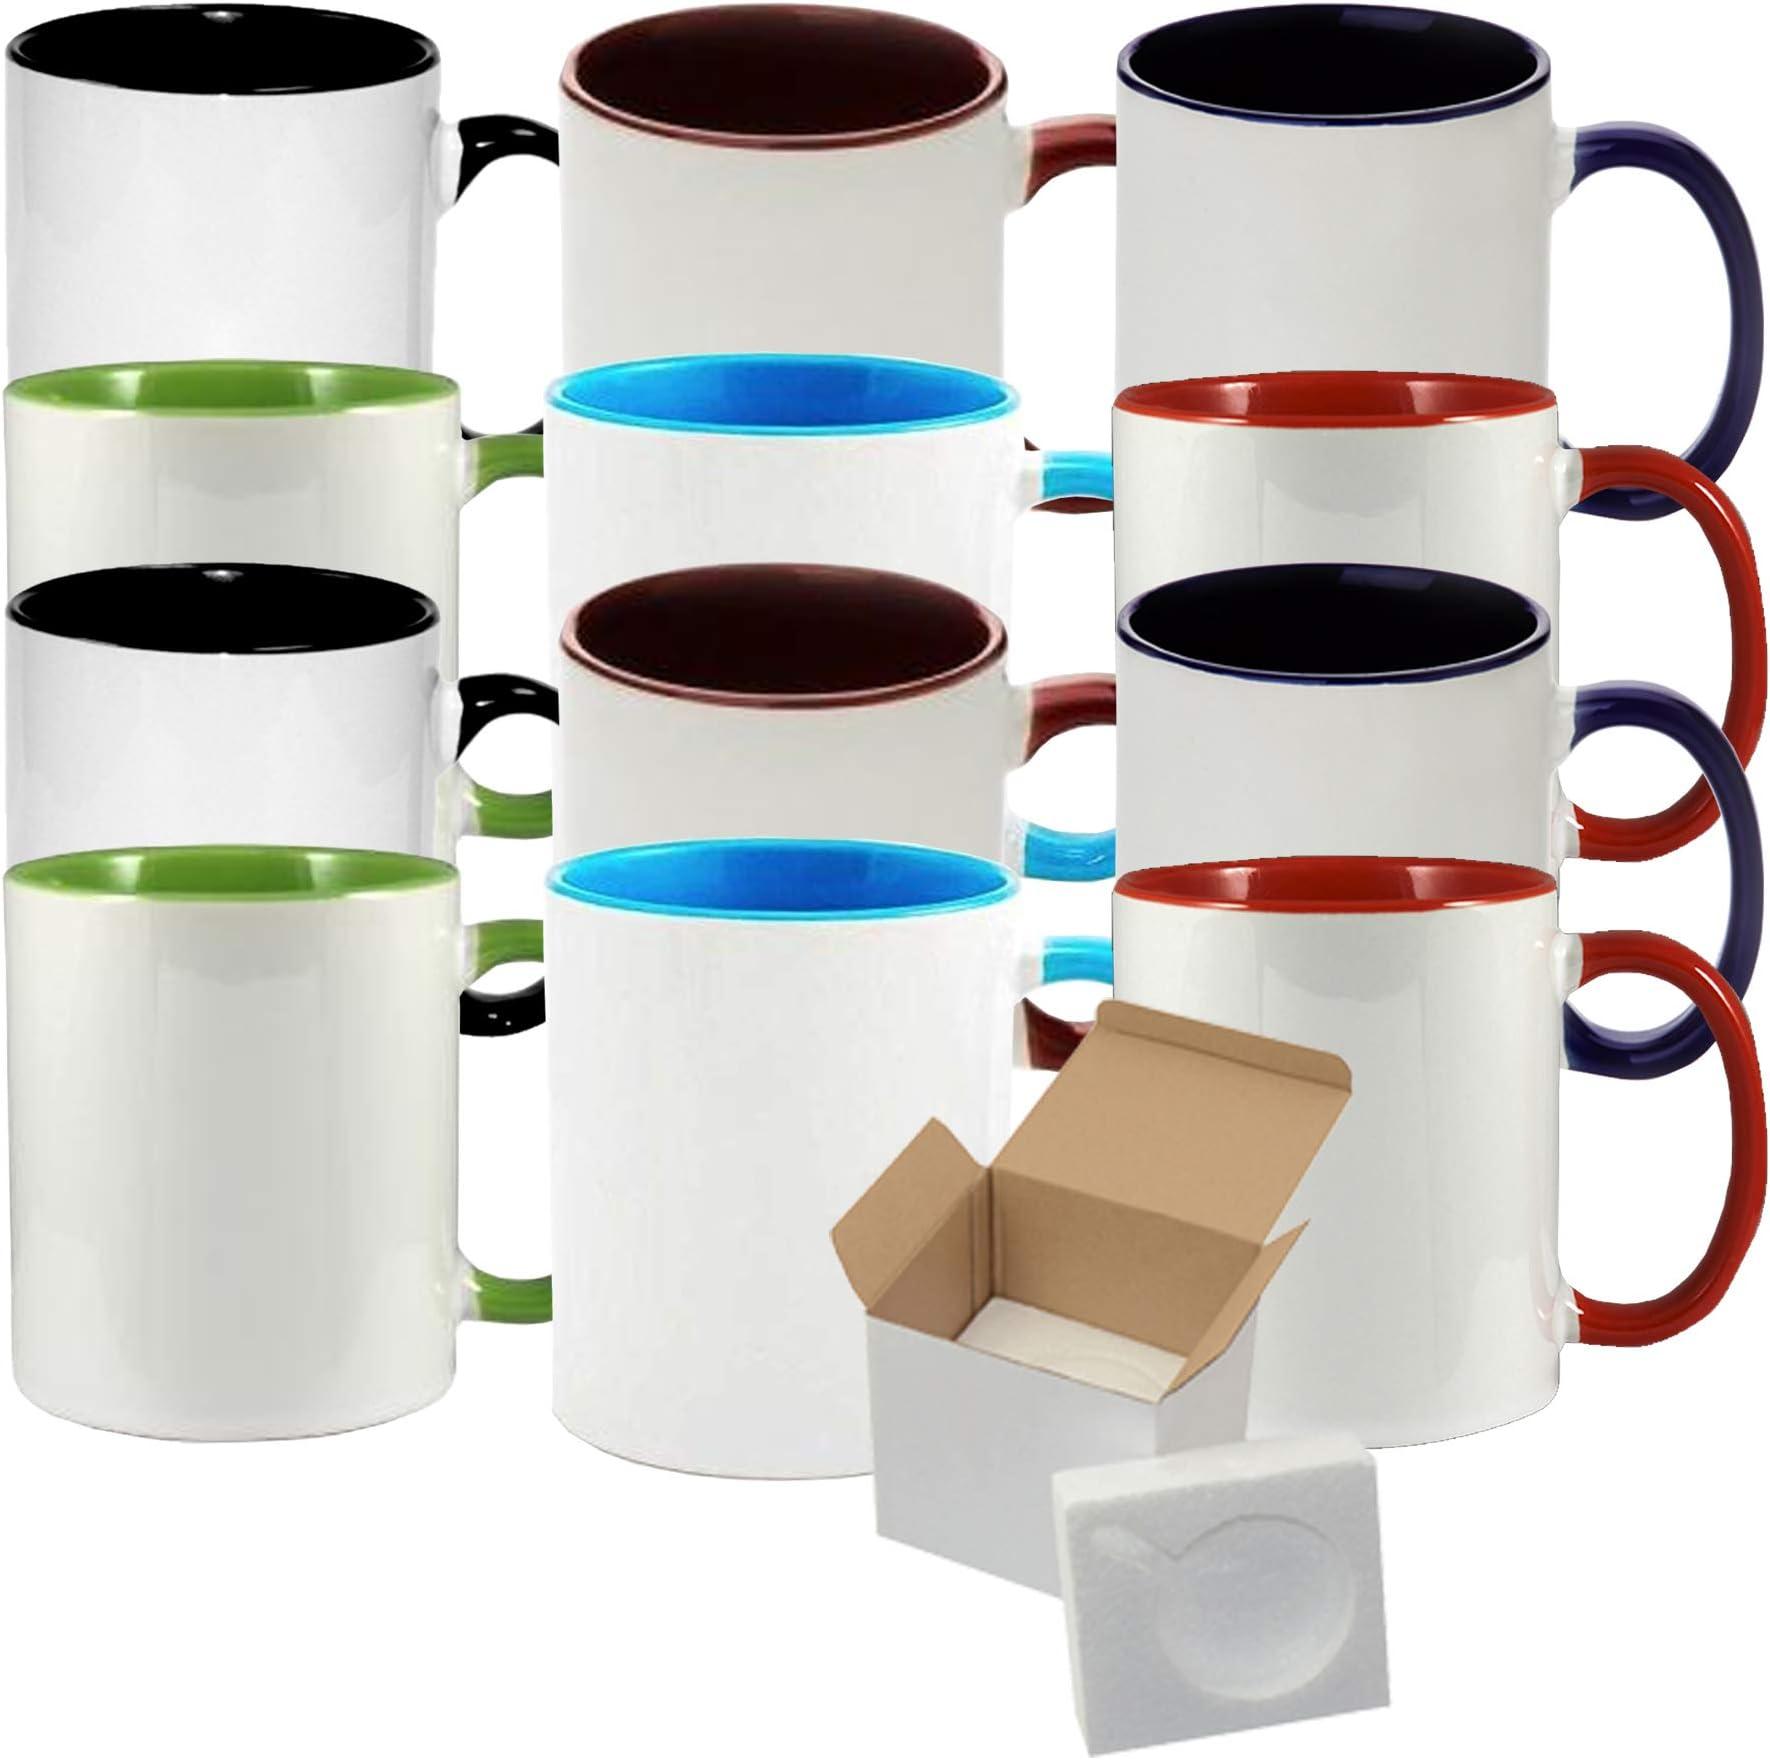 12 oz tall   Coffee mug blueredyellow blended